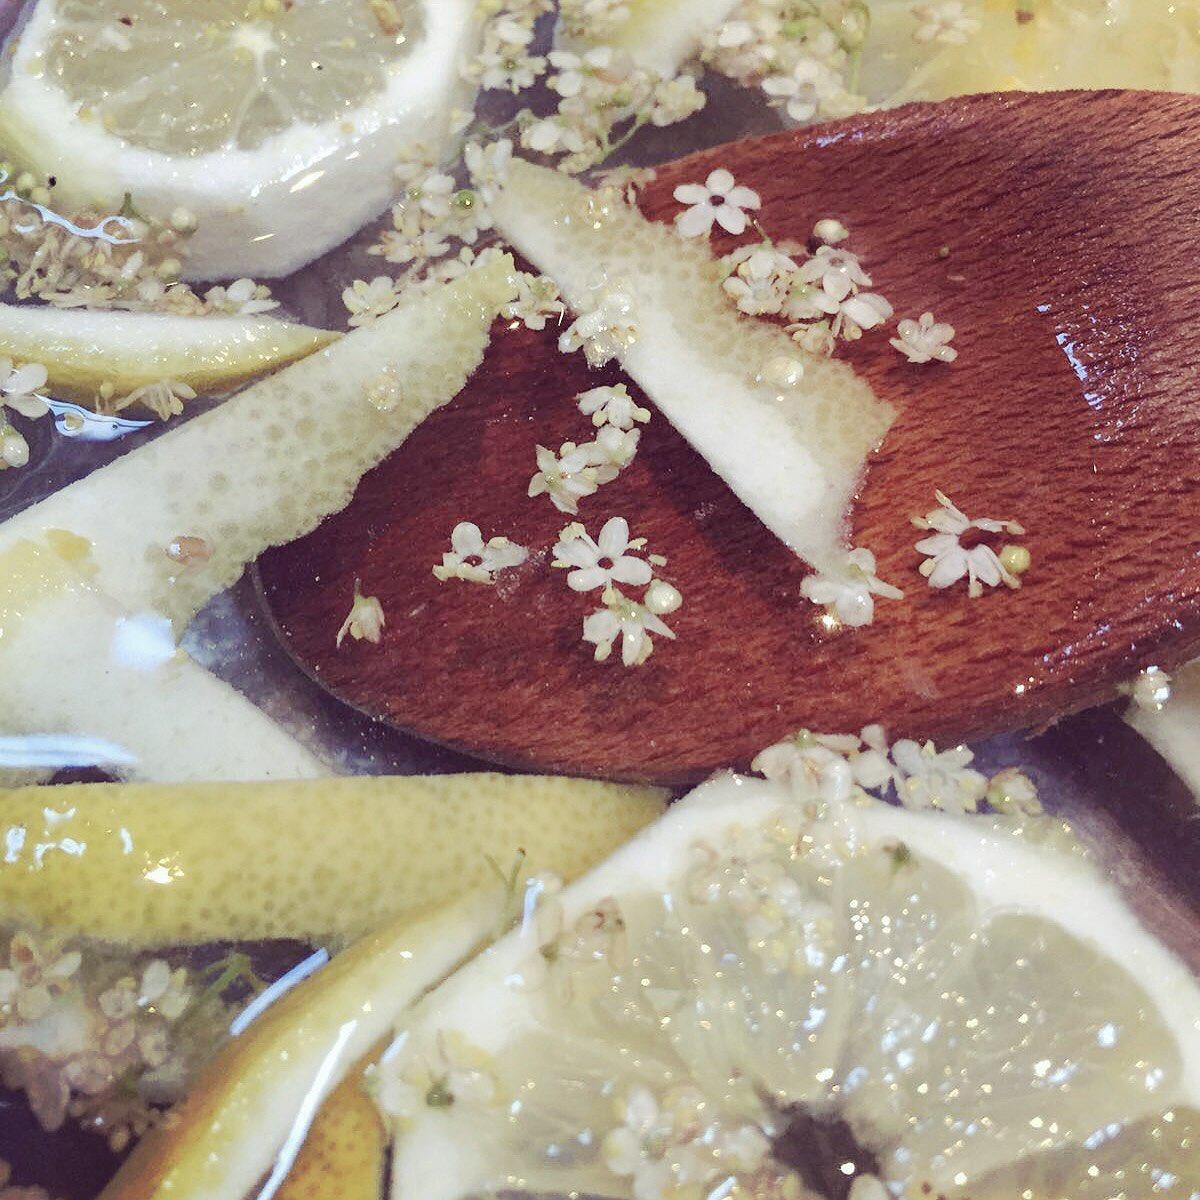 Making Elderflower Cordial ???????????? https://t.co/Rg0a99BFLO